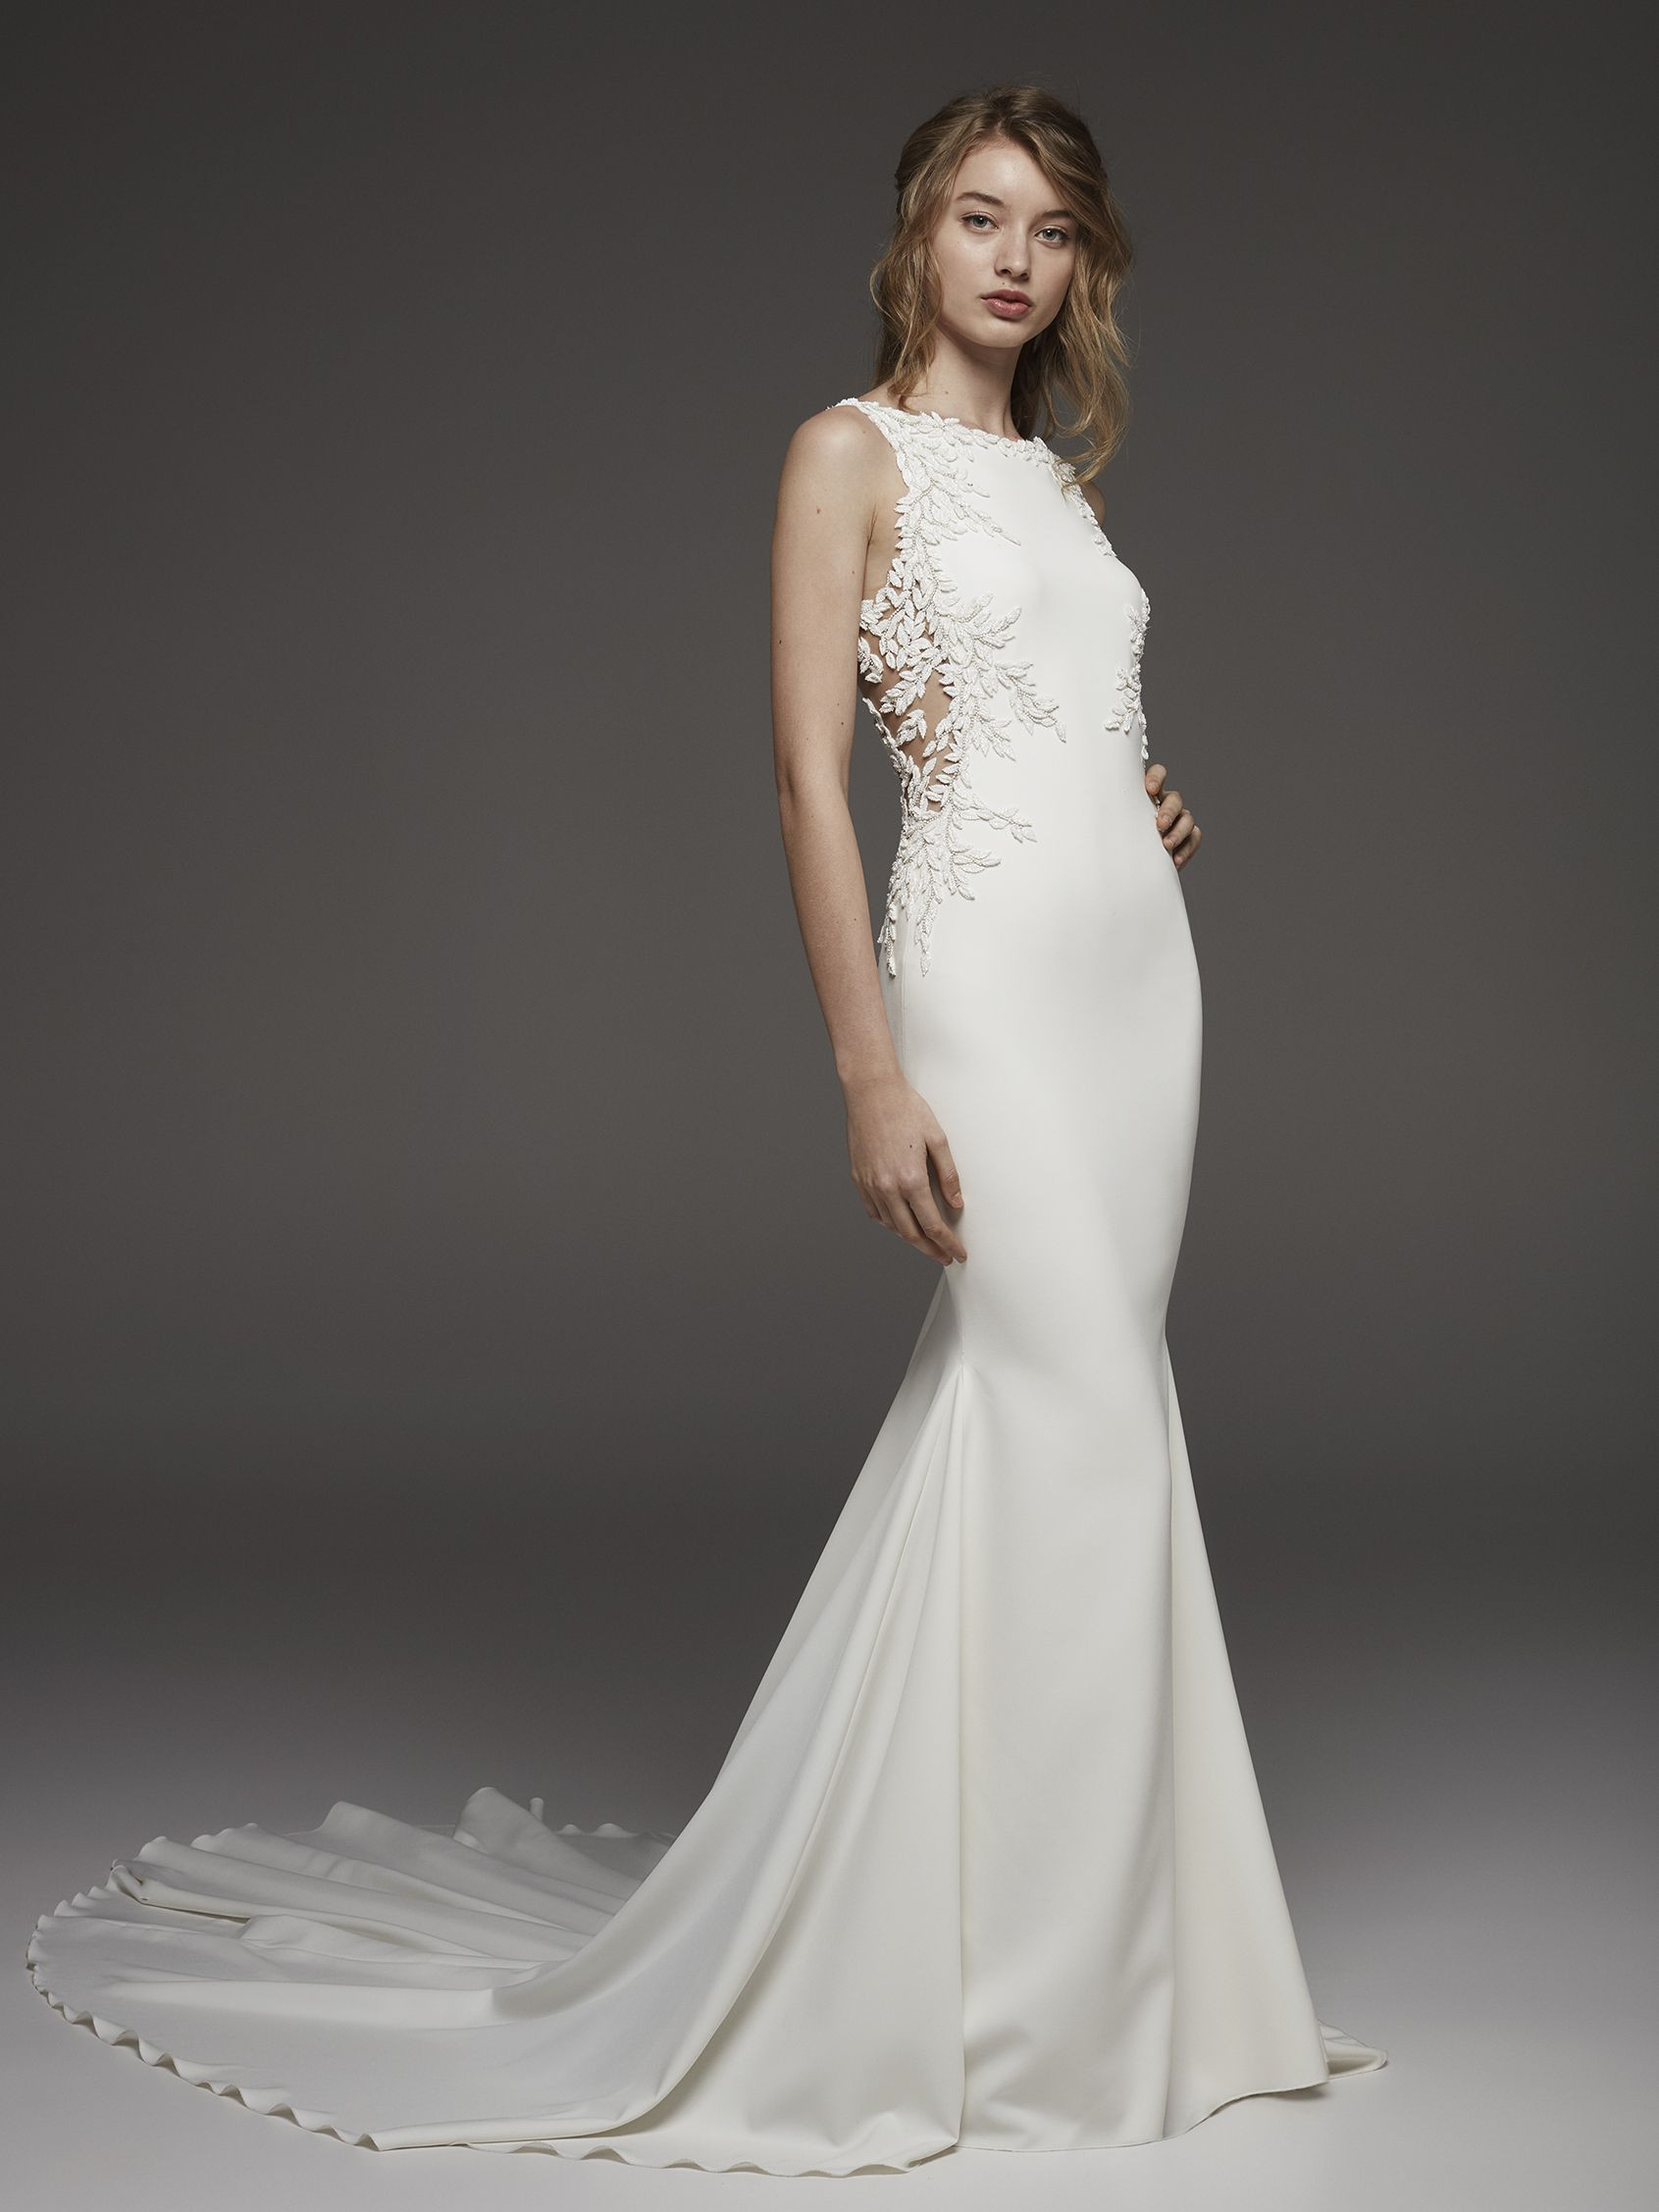 Mira Couture Atelier Pronovias Hosta Wedding Dress Bridal Gown Chicago Boutique Front